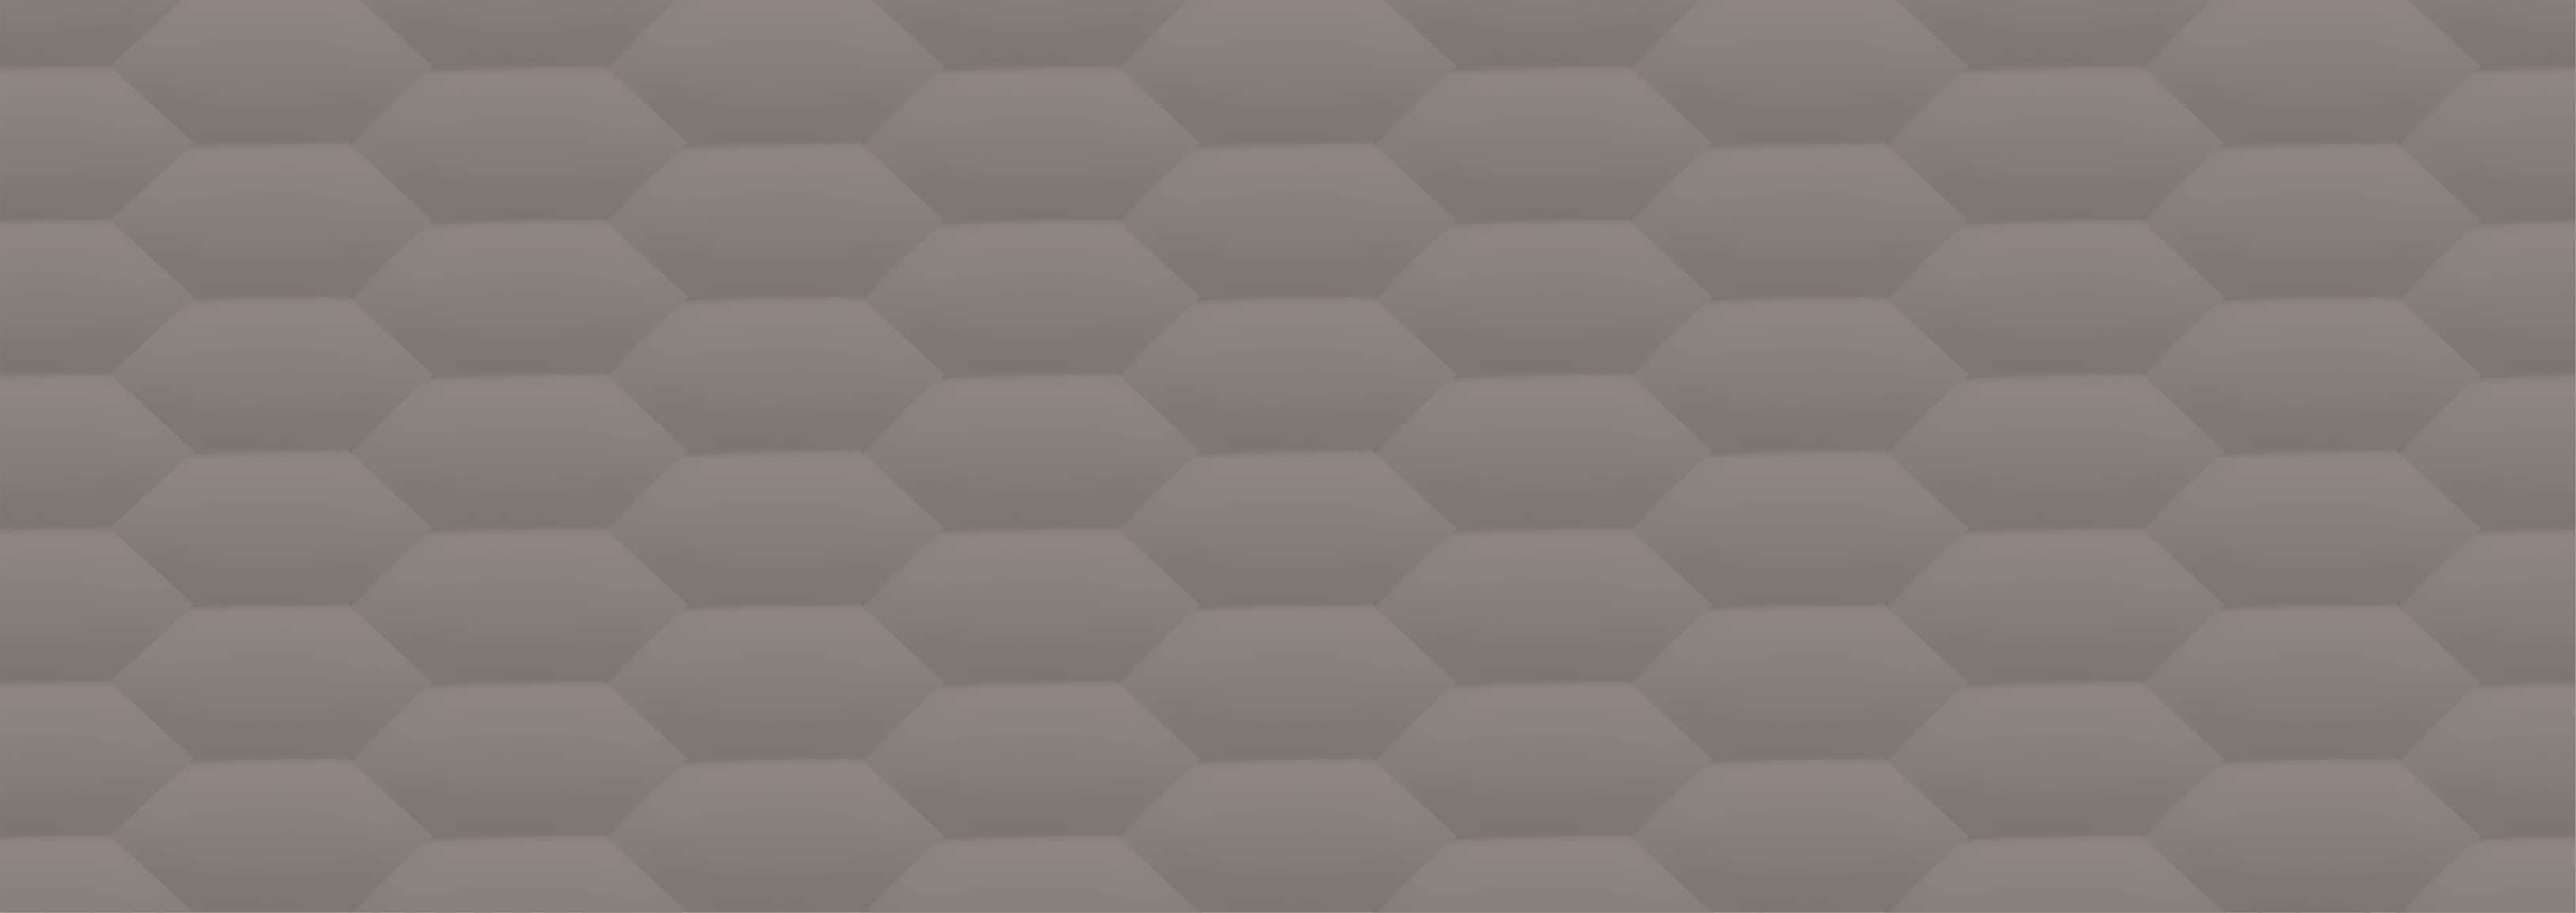 25X70 Update Fon Soft Mink Glossy